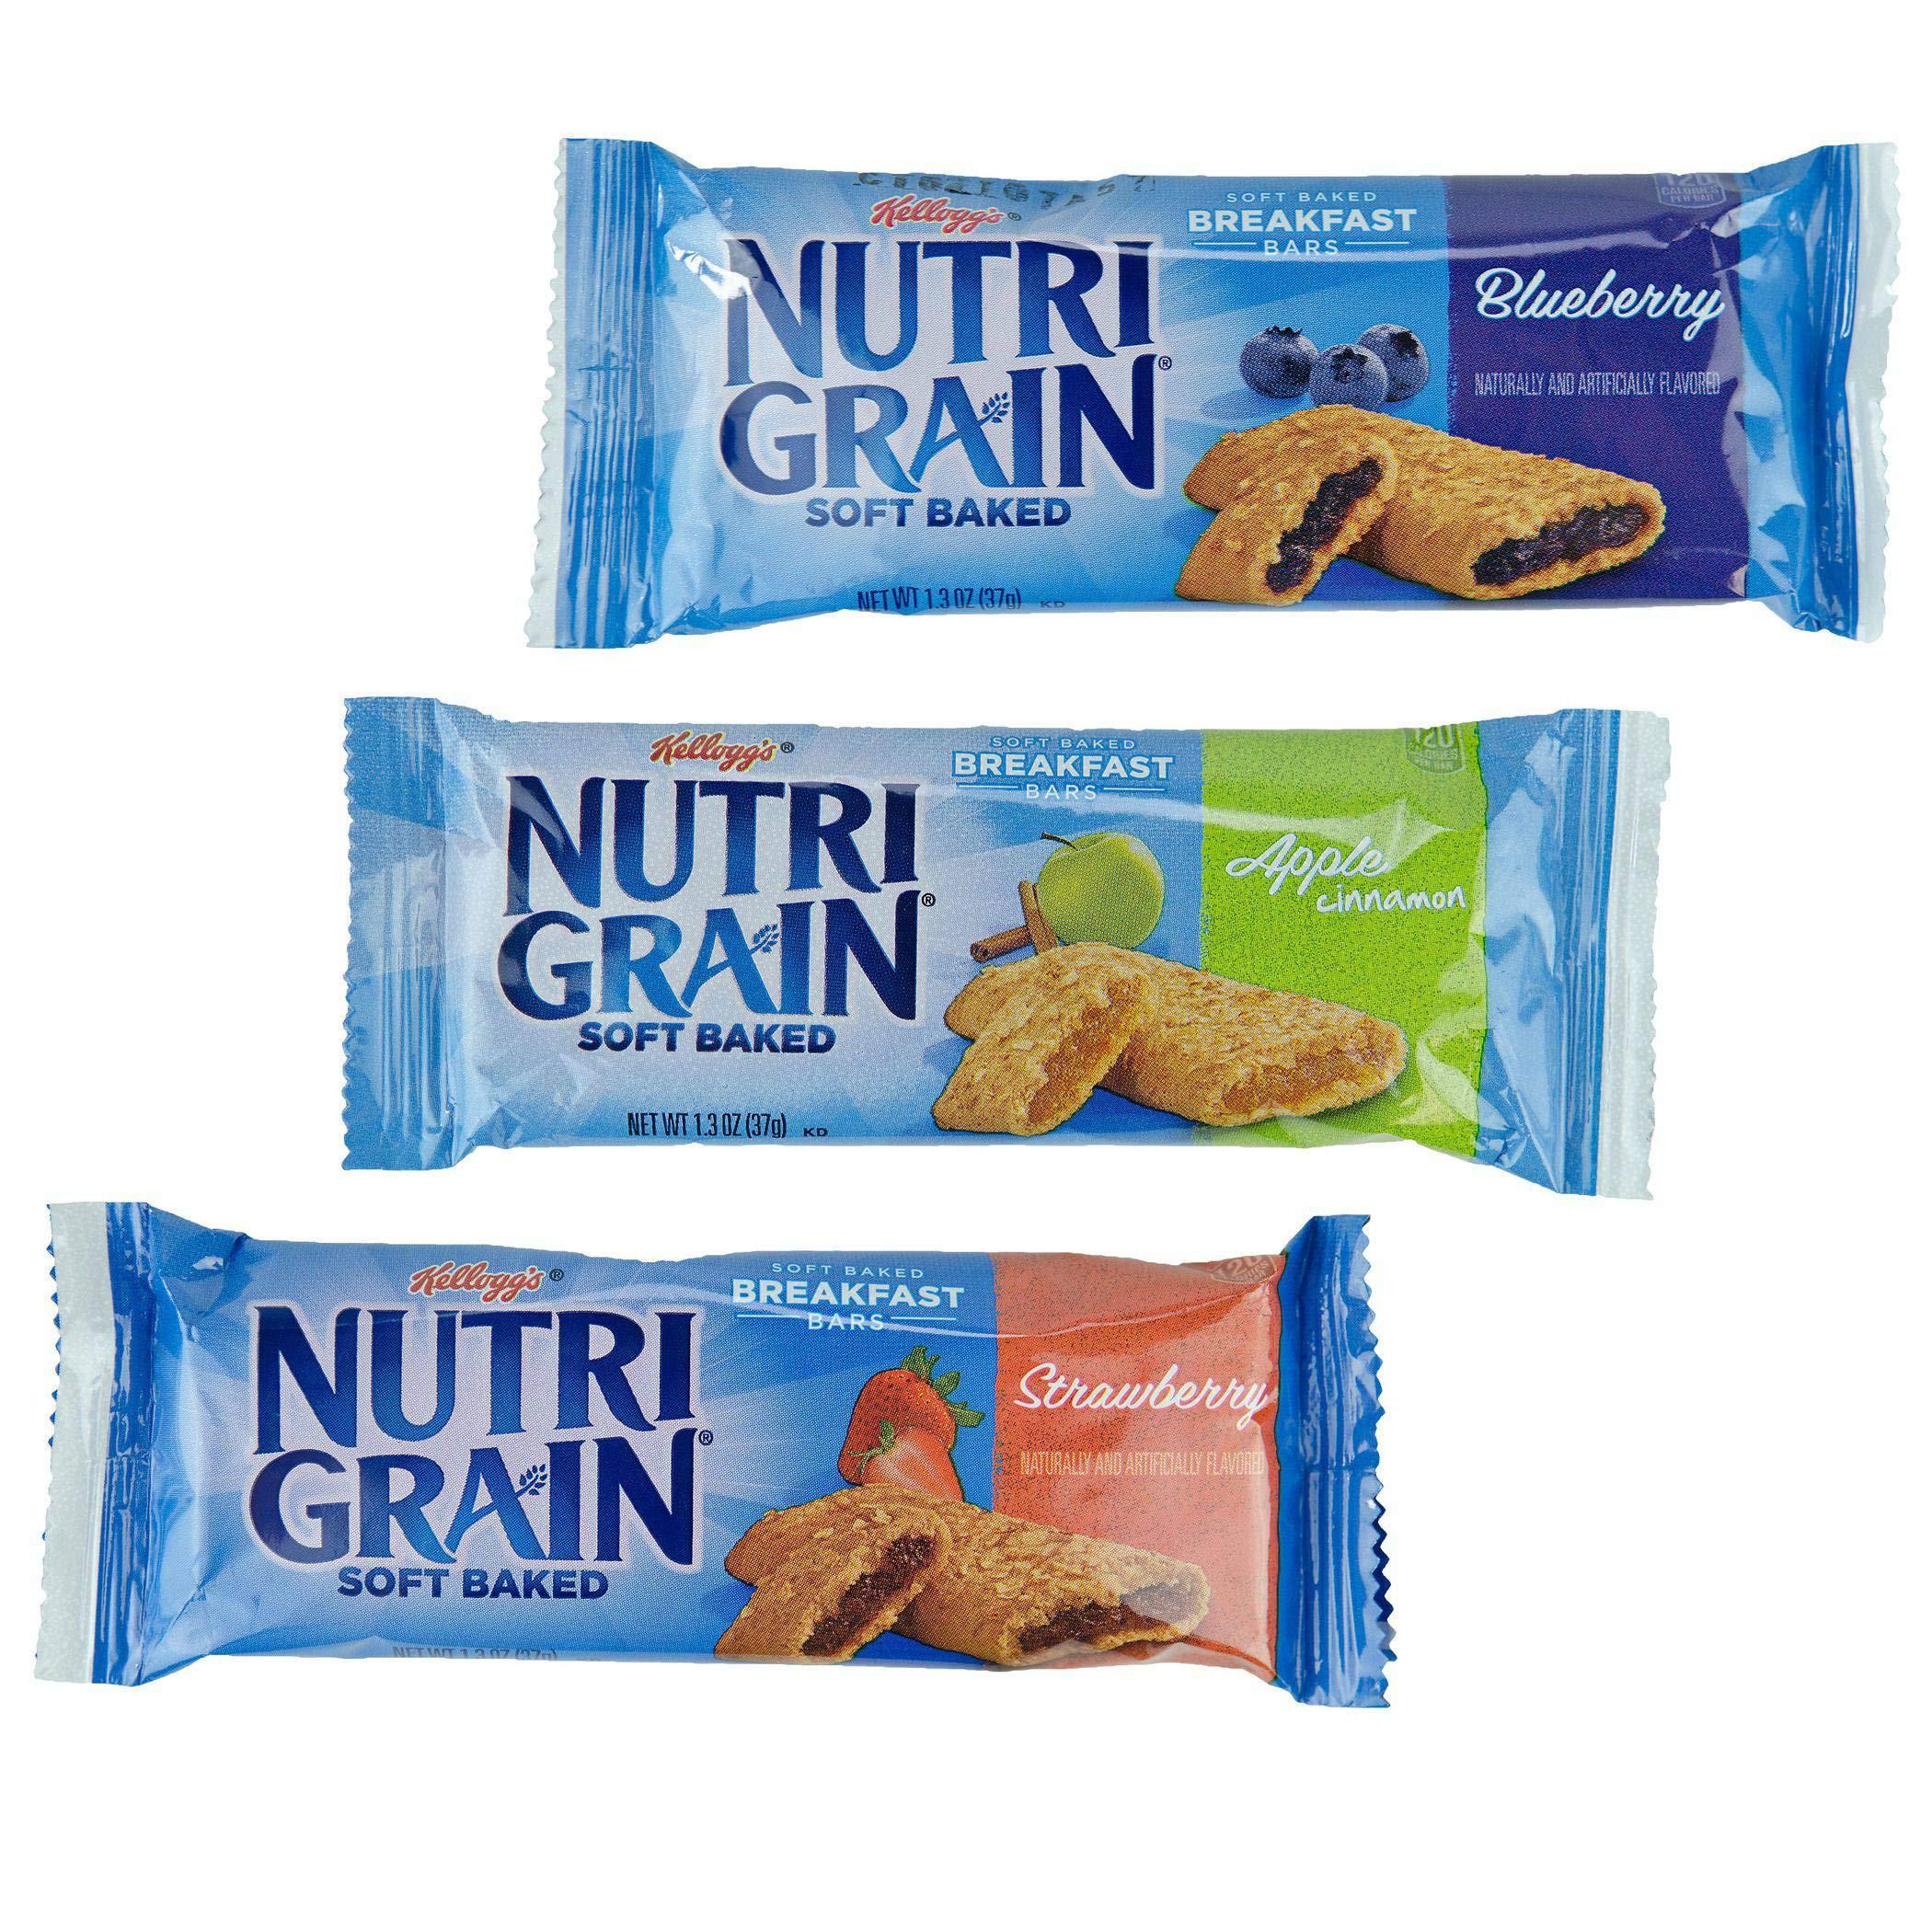 Nutri-Grain Cereal Bar Variety Pack - 1.3 oz. bar, 48 per case